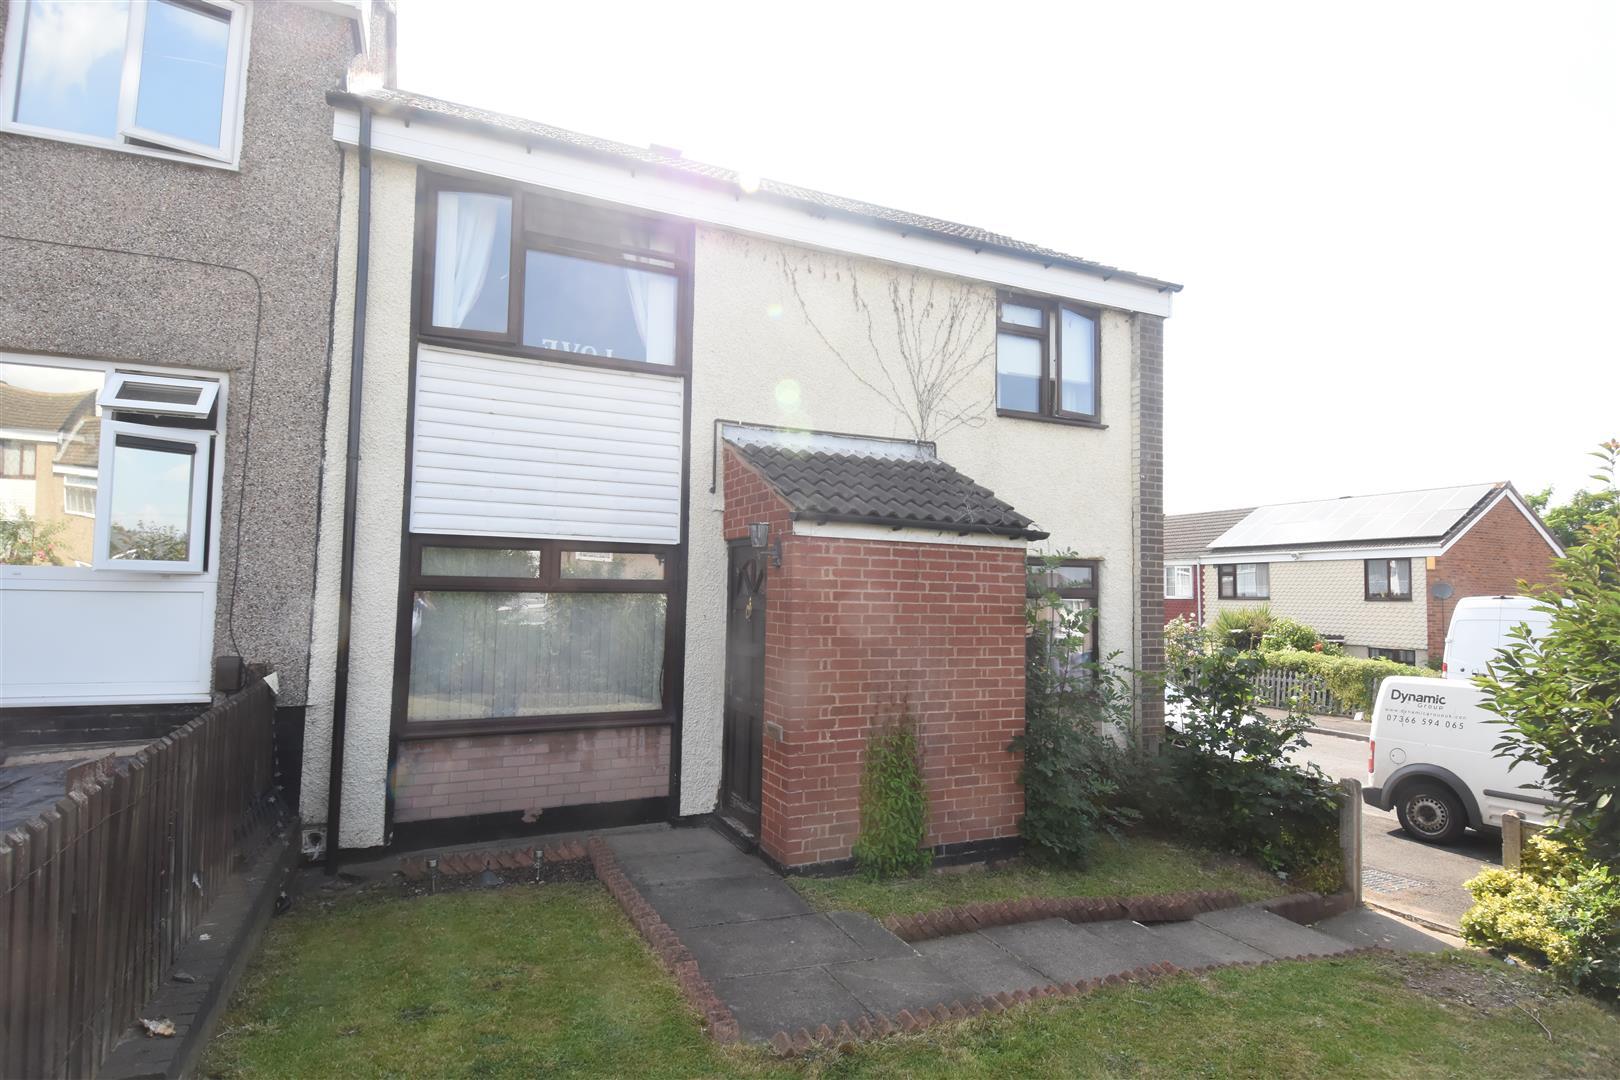 3 bed house for sale in Asholme Close, Bromford Bridge, Birmingham 1